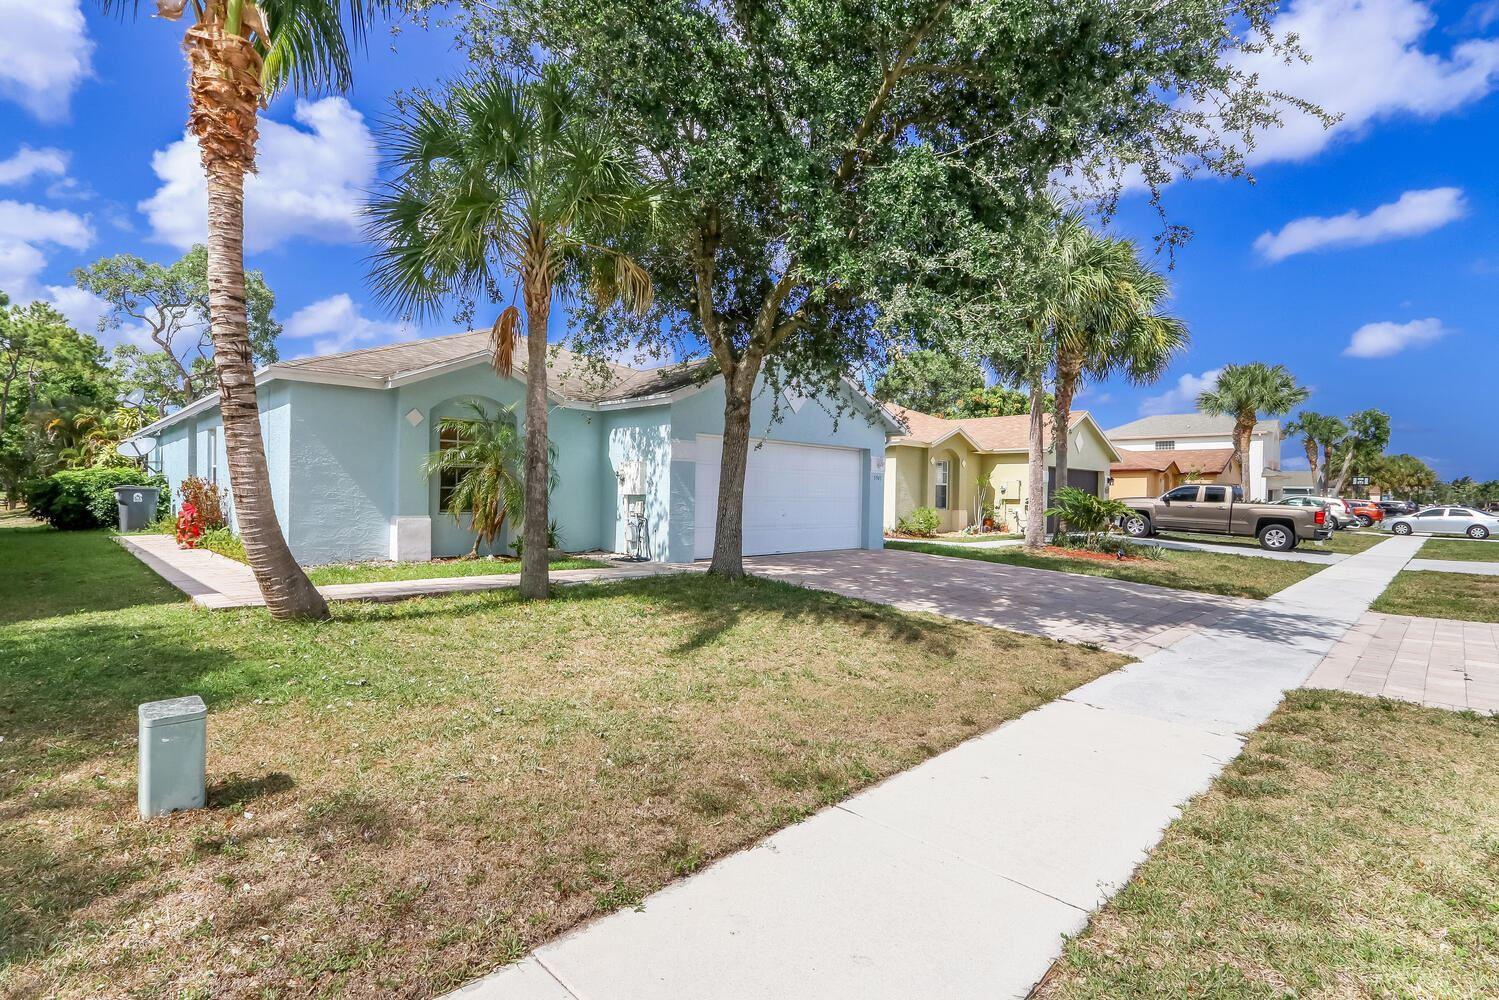 5941 Azalea Circle, West Palm Beach, FL 33415 - #: RX-10725013